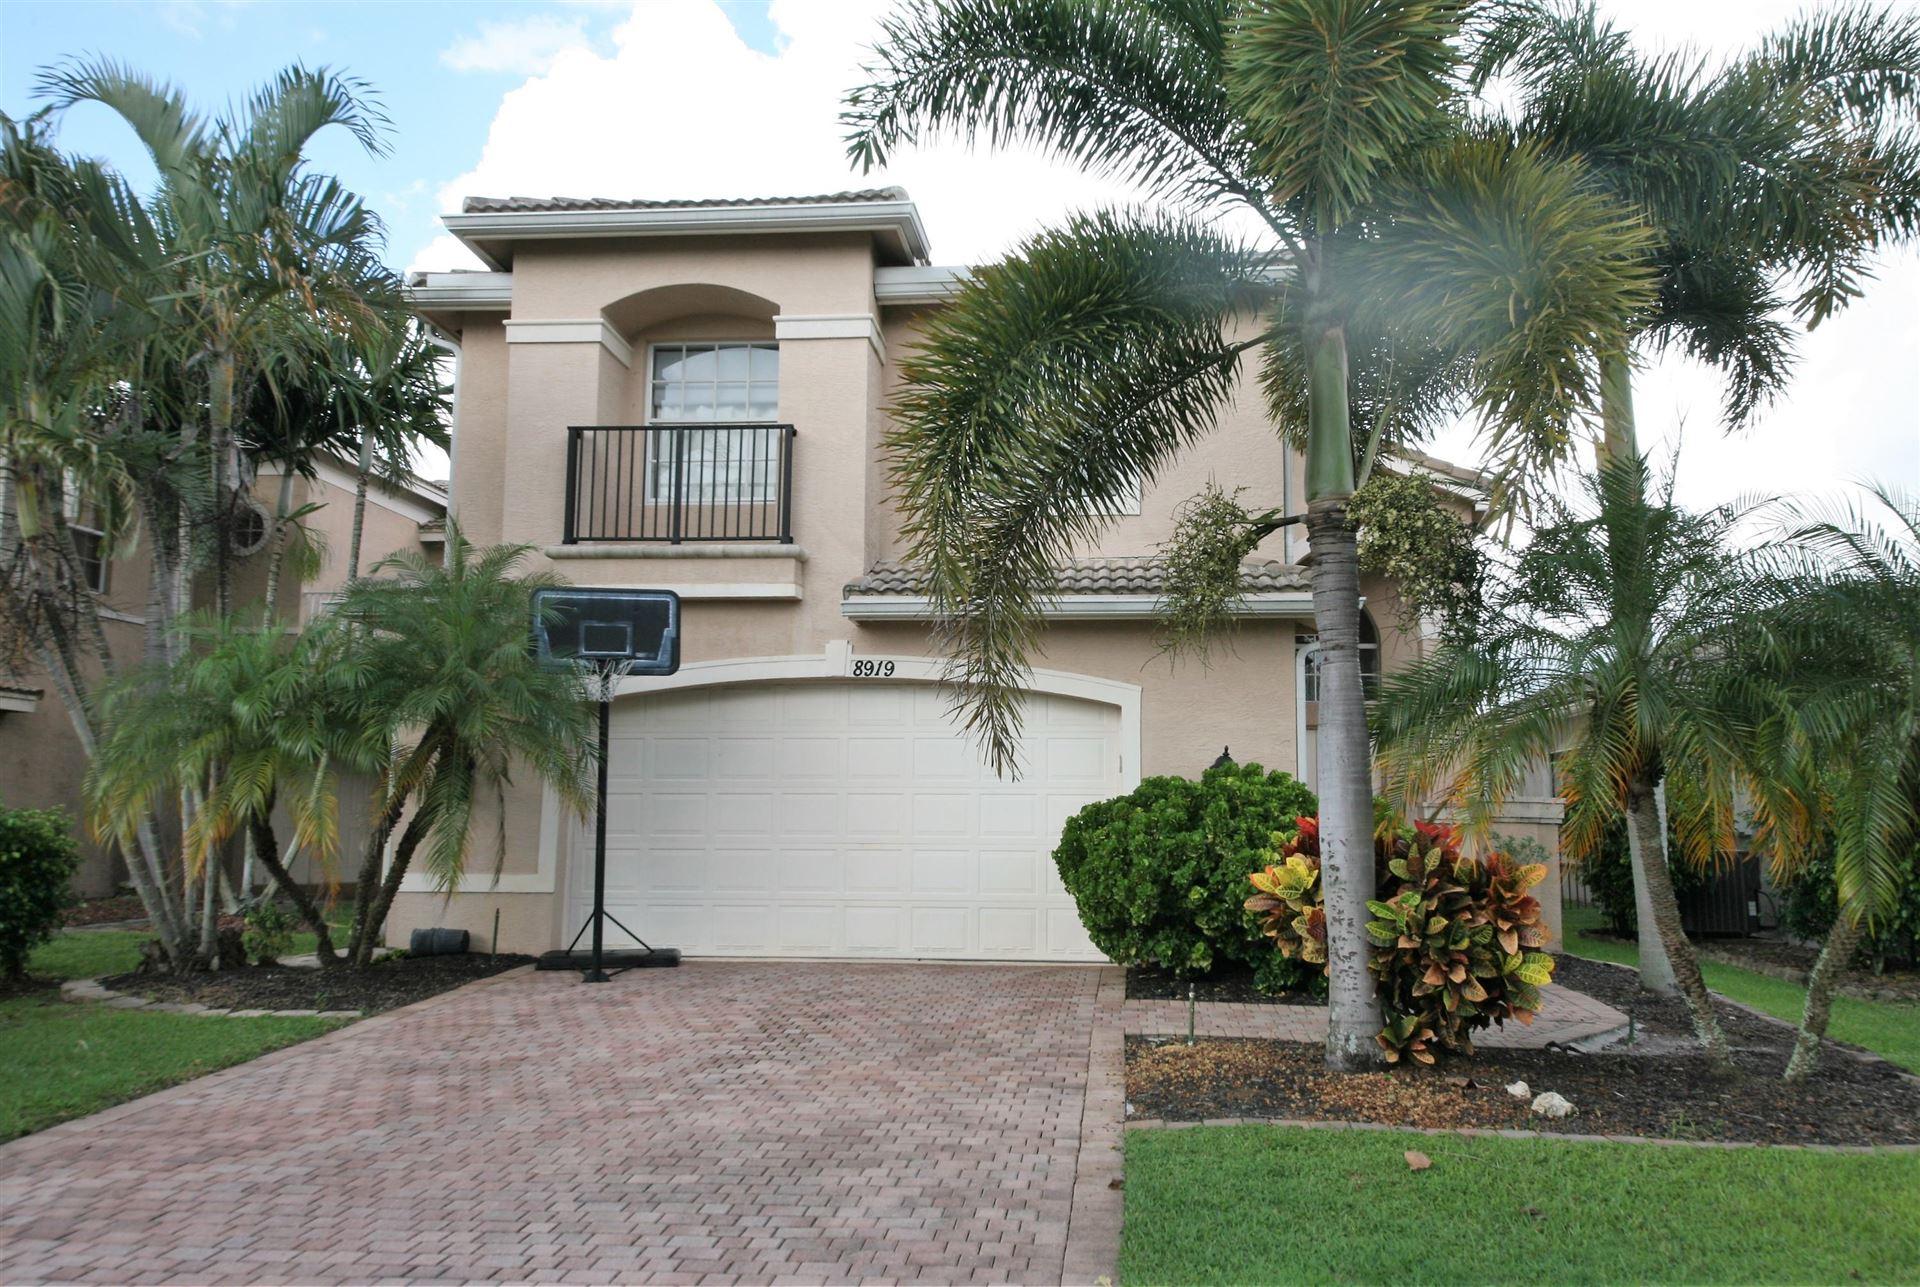 8919 Chestnut Ridge Way, Boynton Beach, FL 33473 - #: RX-10654914